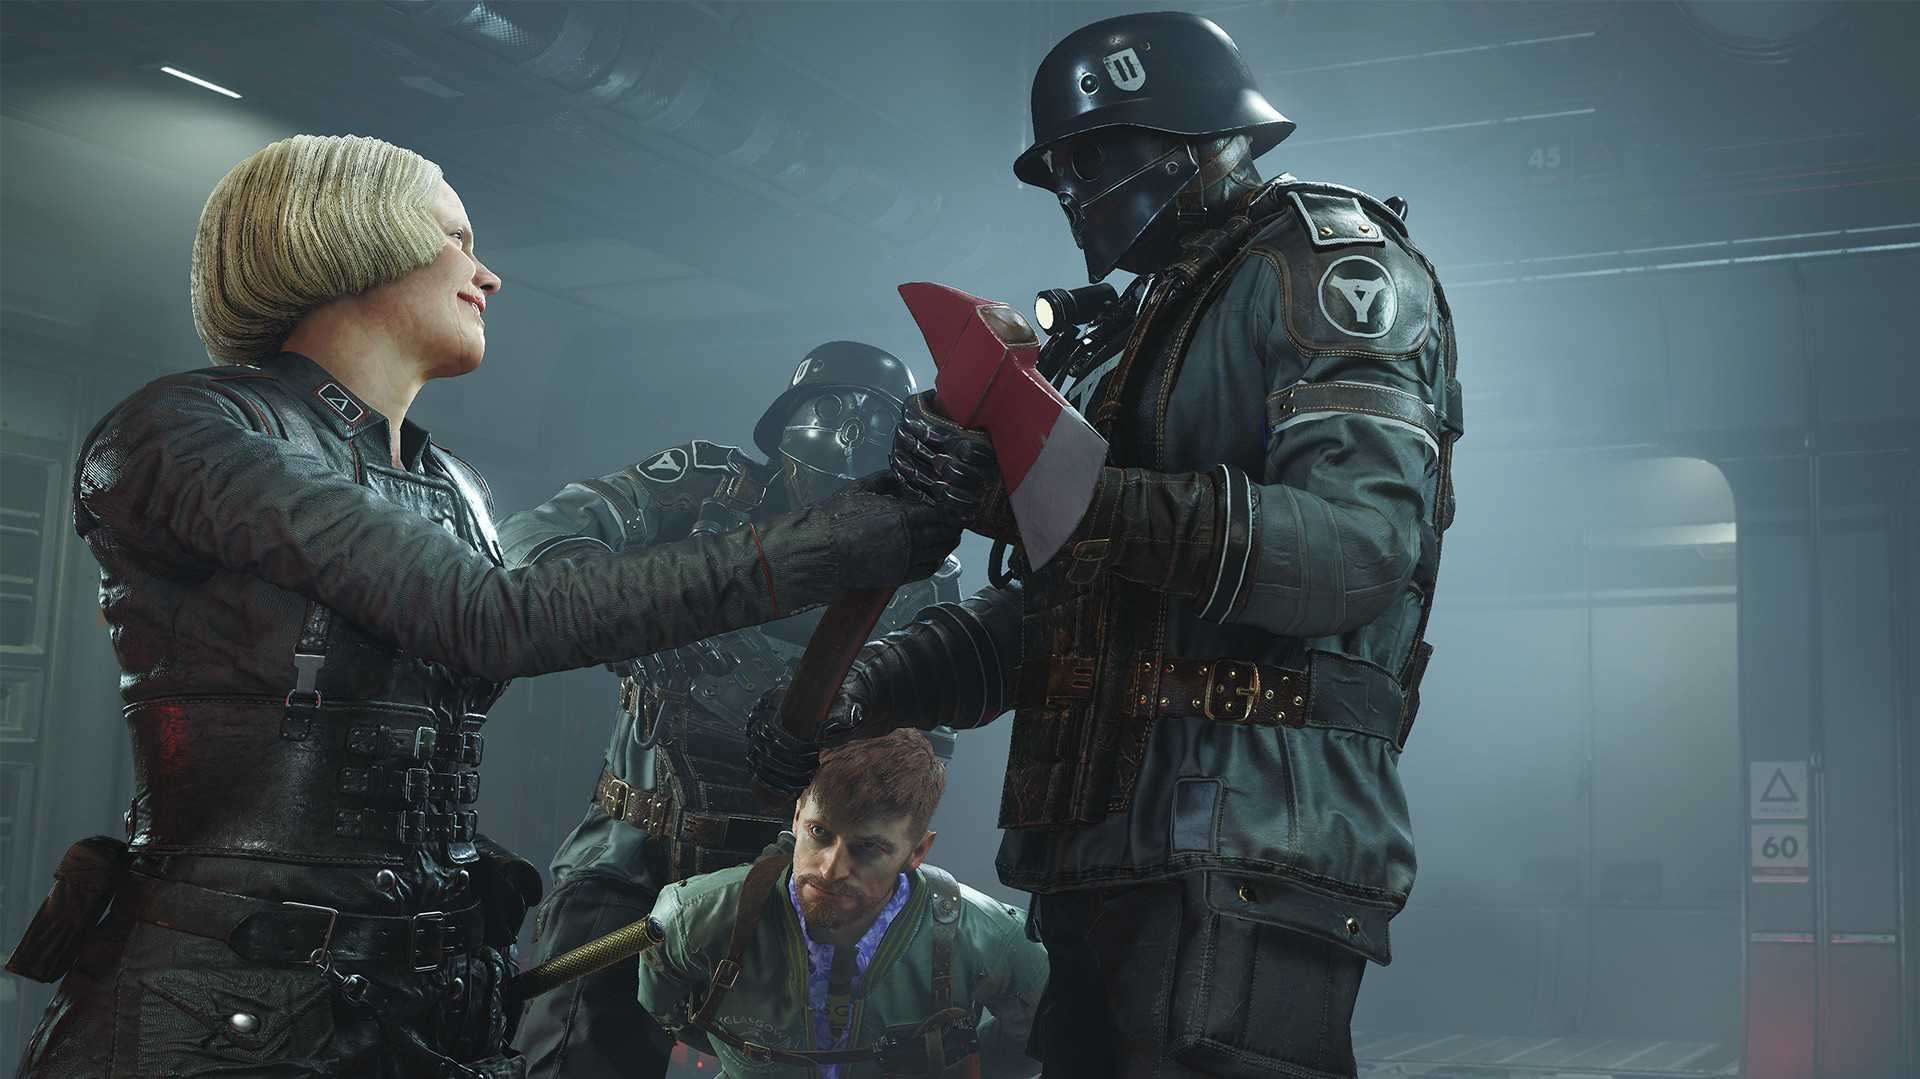 USK lässt Hakenkreuze in Videospielen